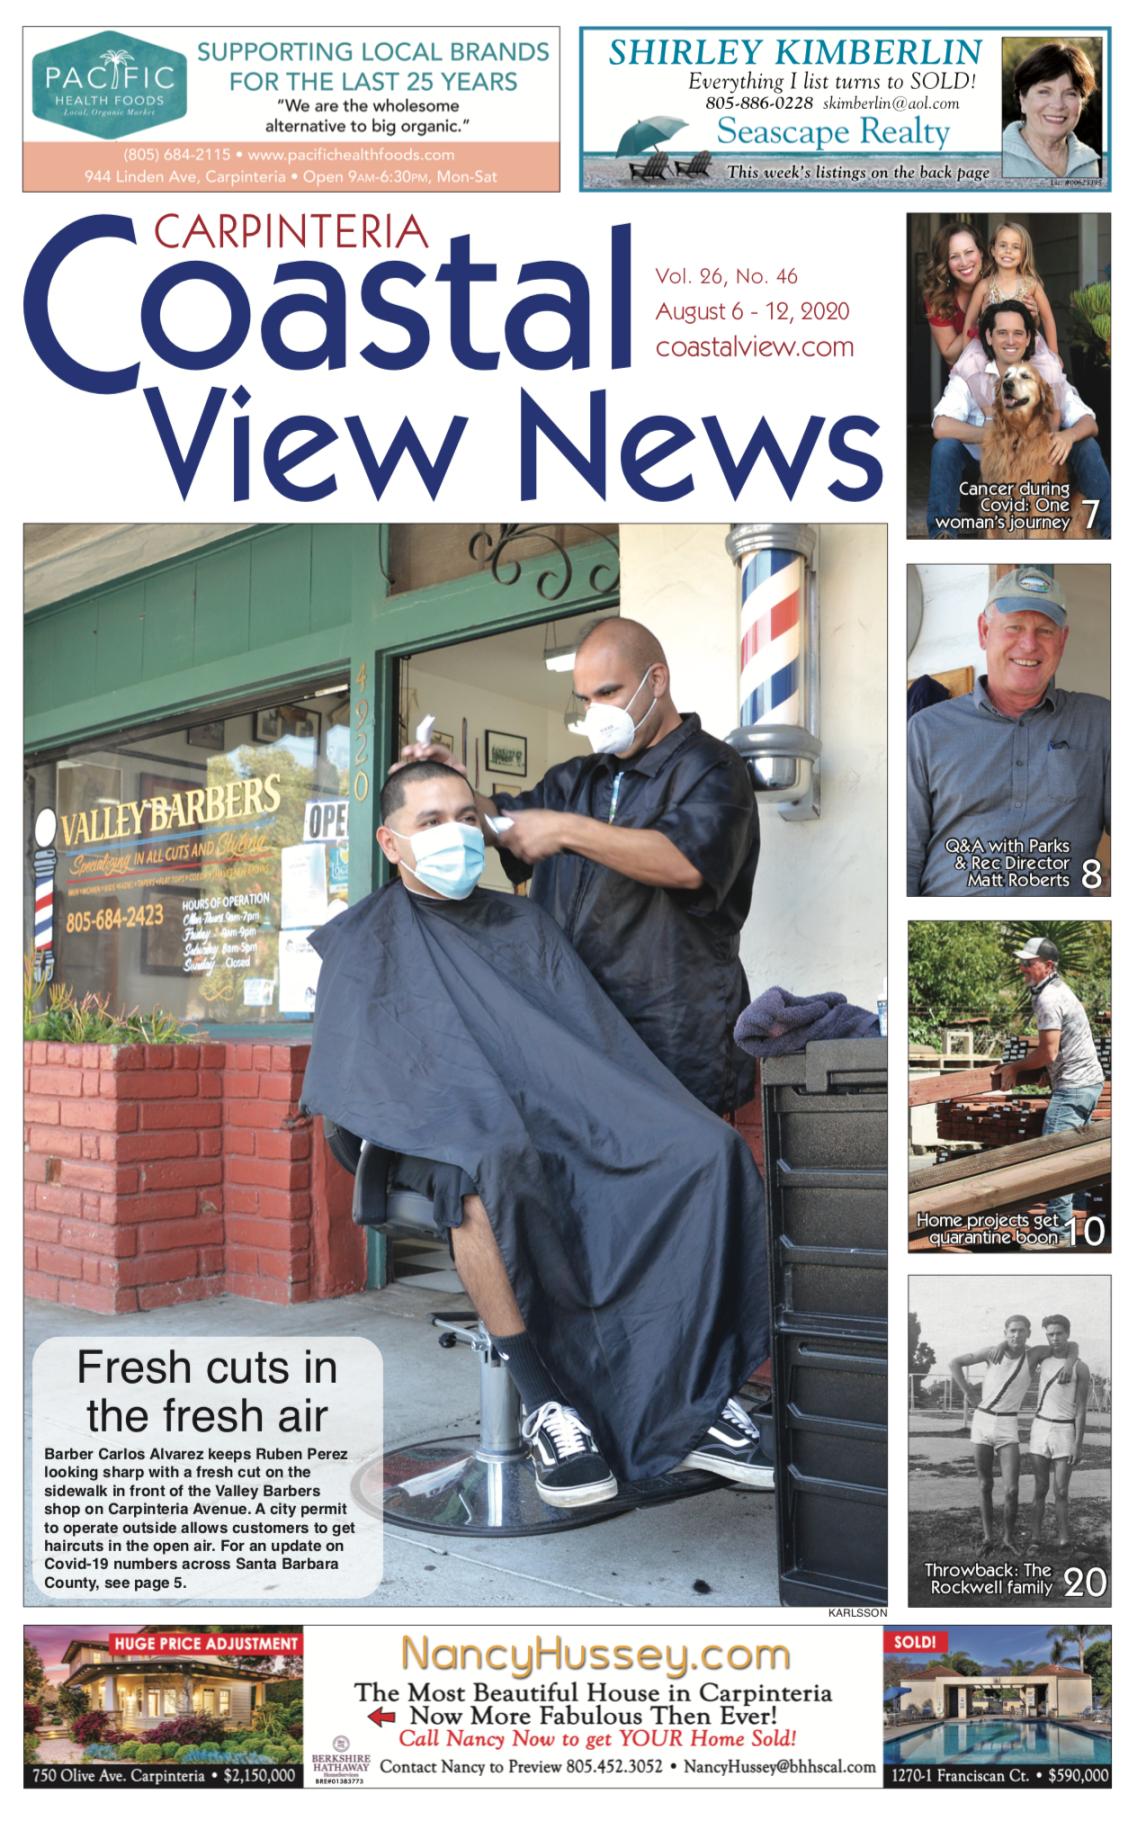 Coastal View News • August 6, 2020